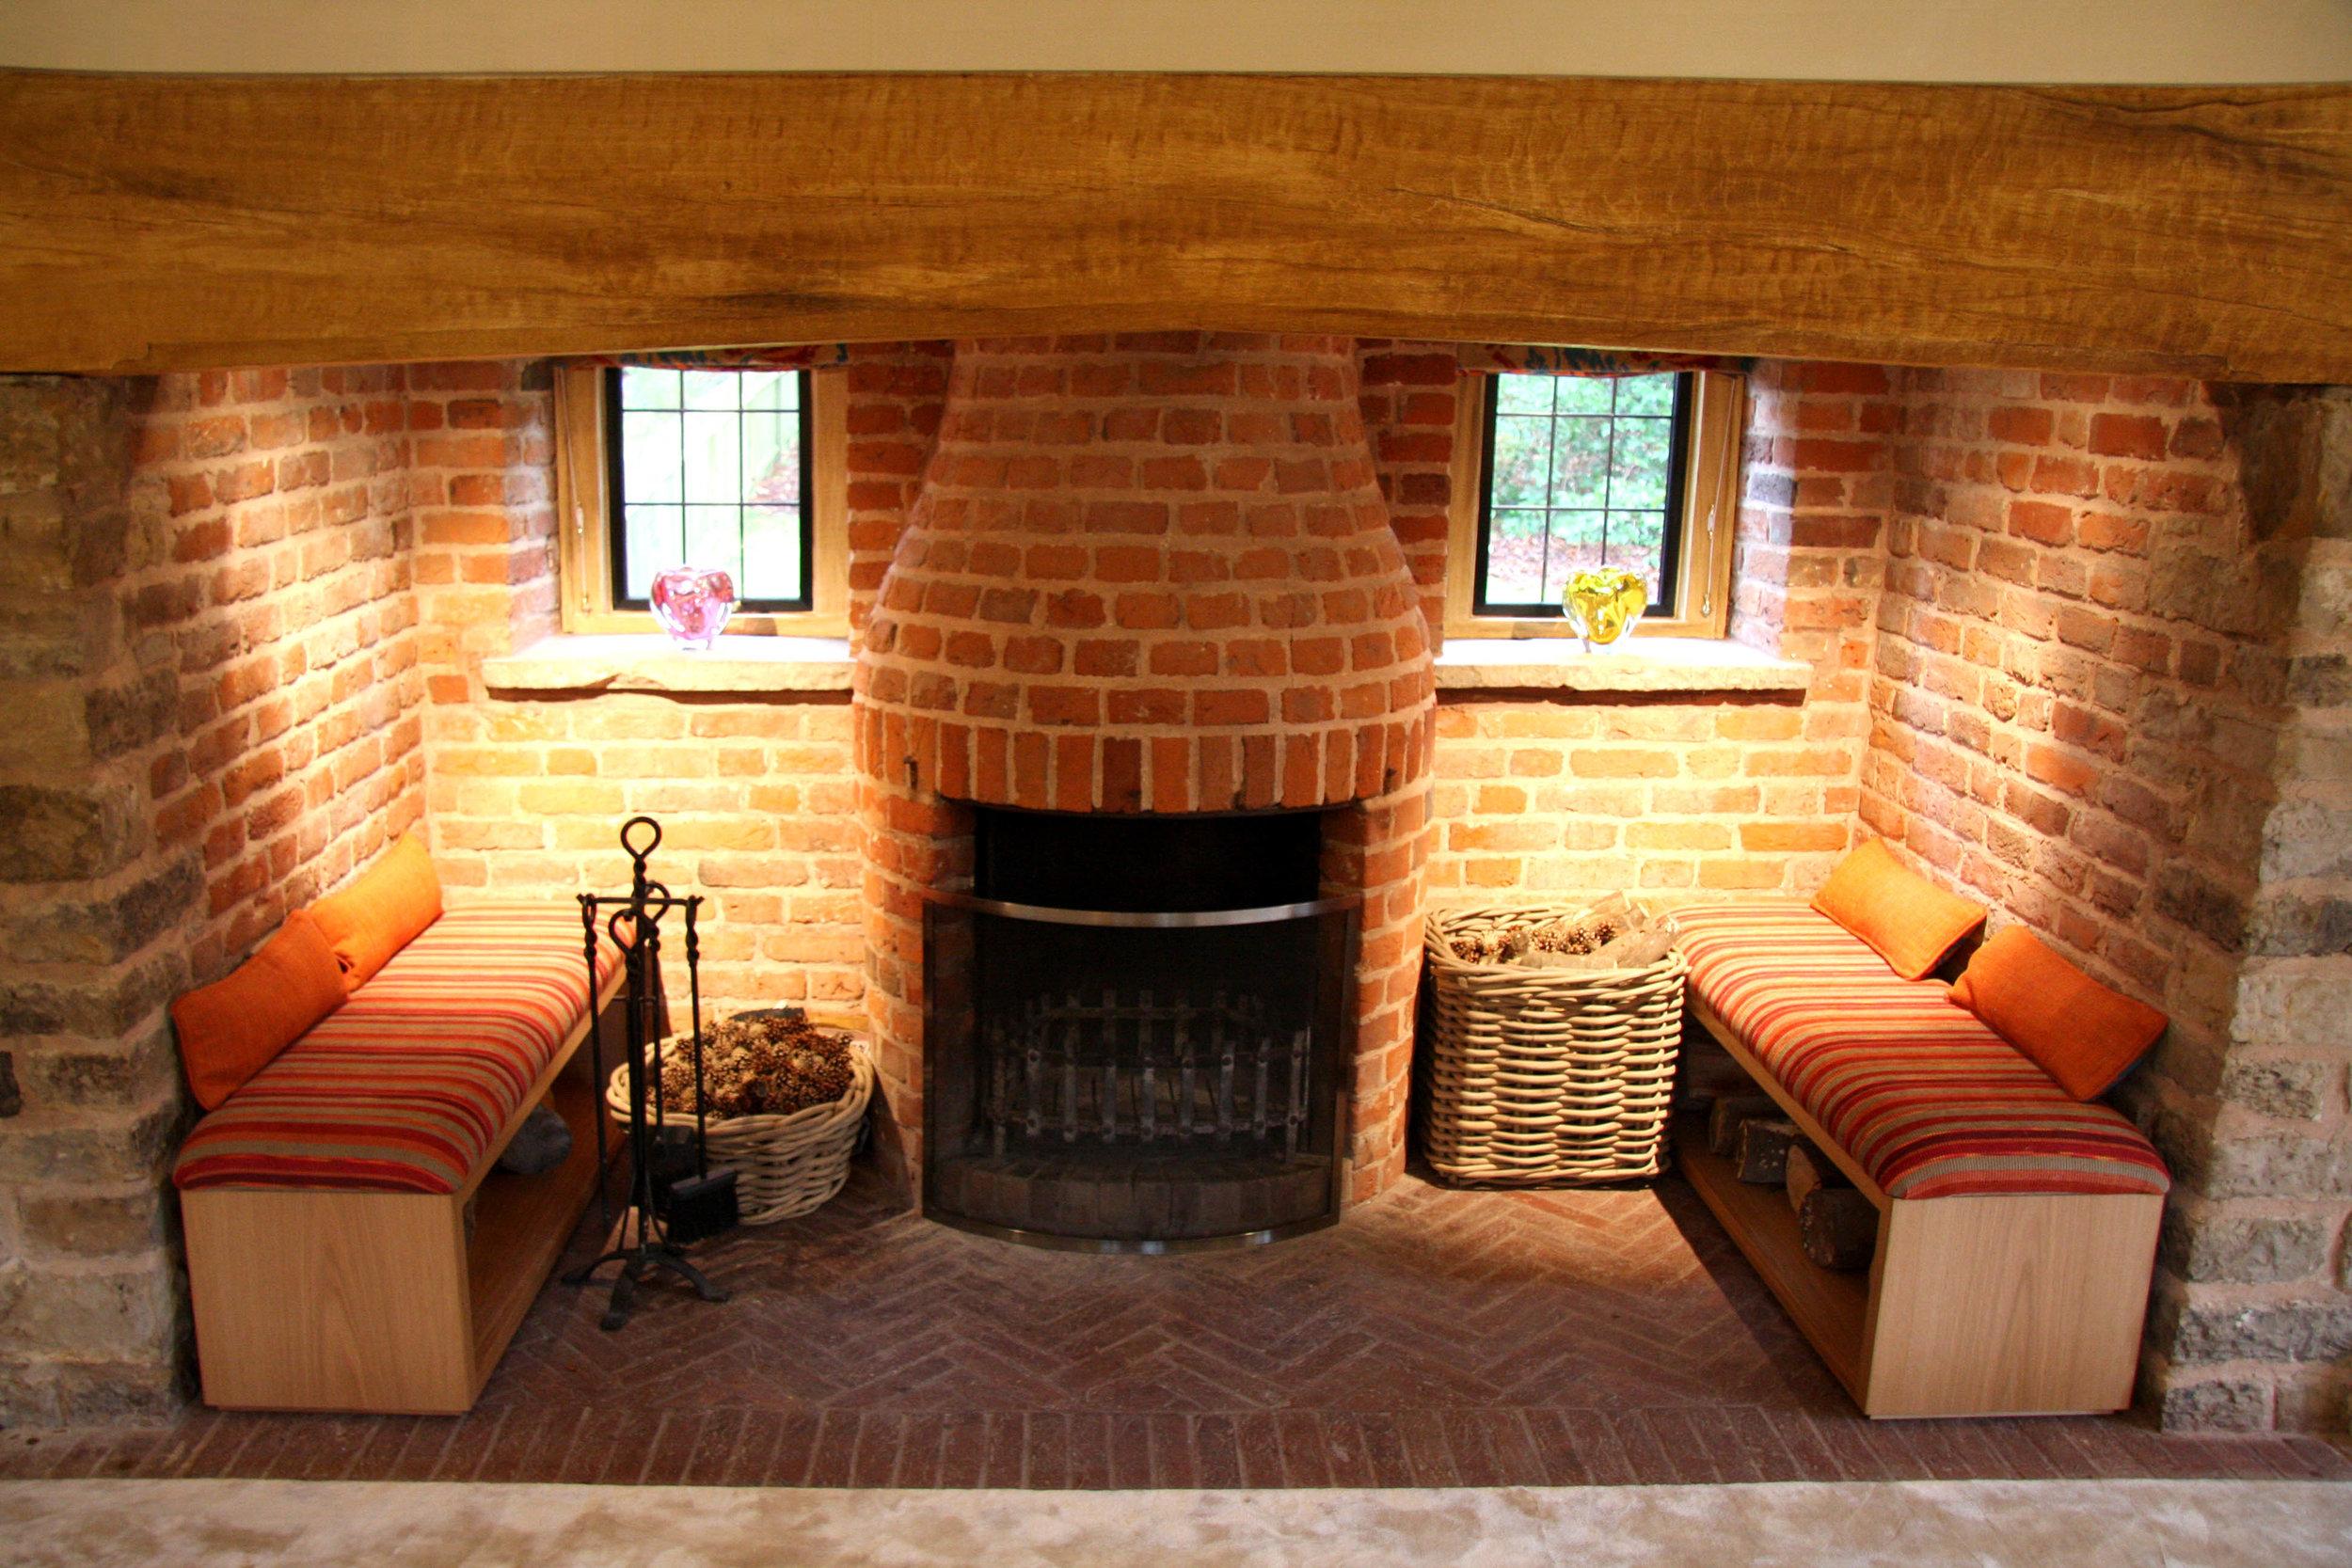 Sussex Arts and crafts house interior design (14).jpg